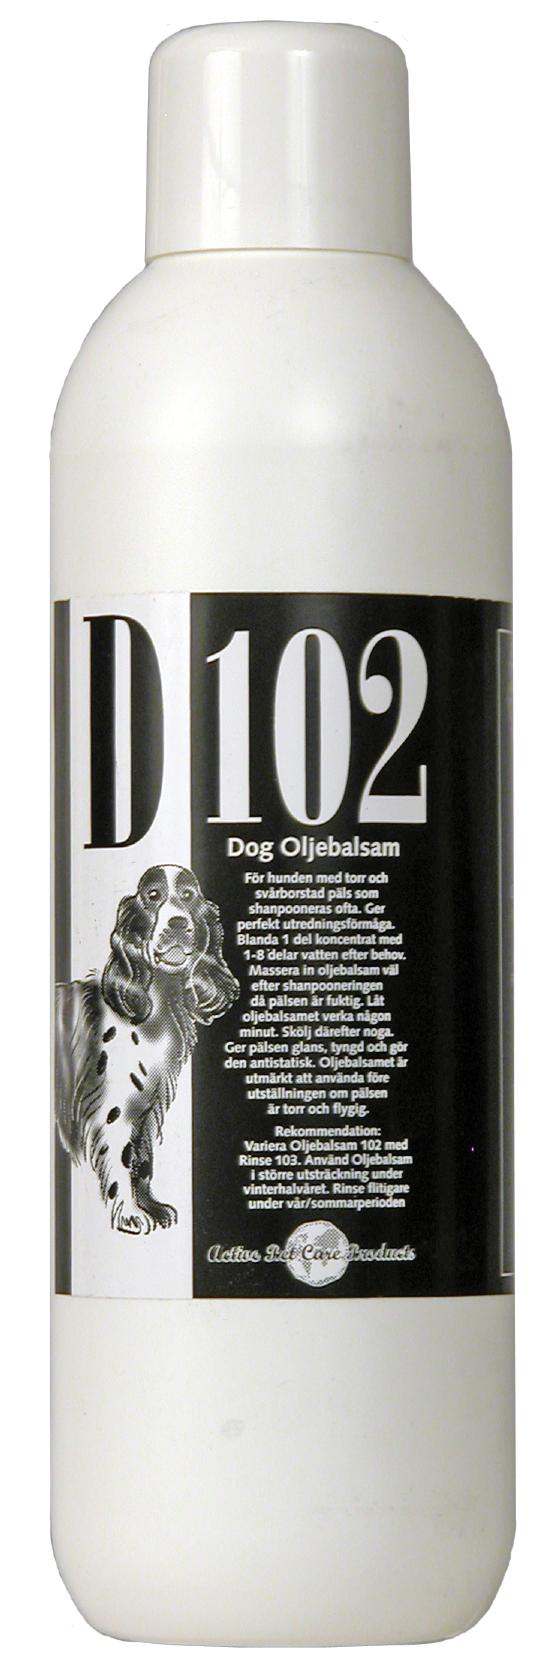 Active Pet Care Balsam D102 Olja 1000ml